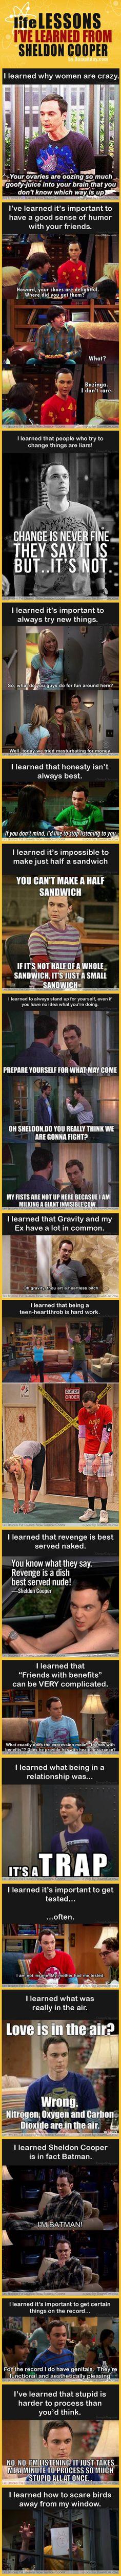 geek, big bang, sheldon cooper, laugh, giggl, funni, life lessons, bang theori, bangs